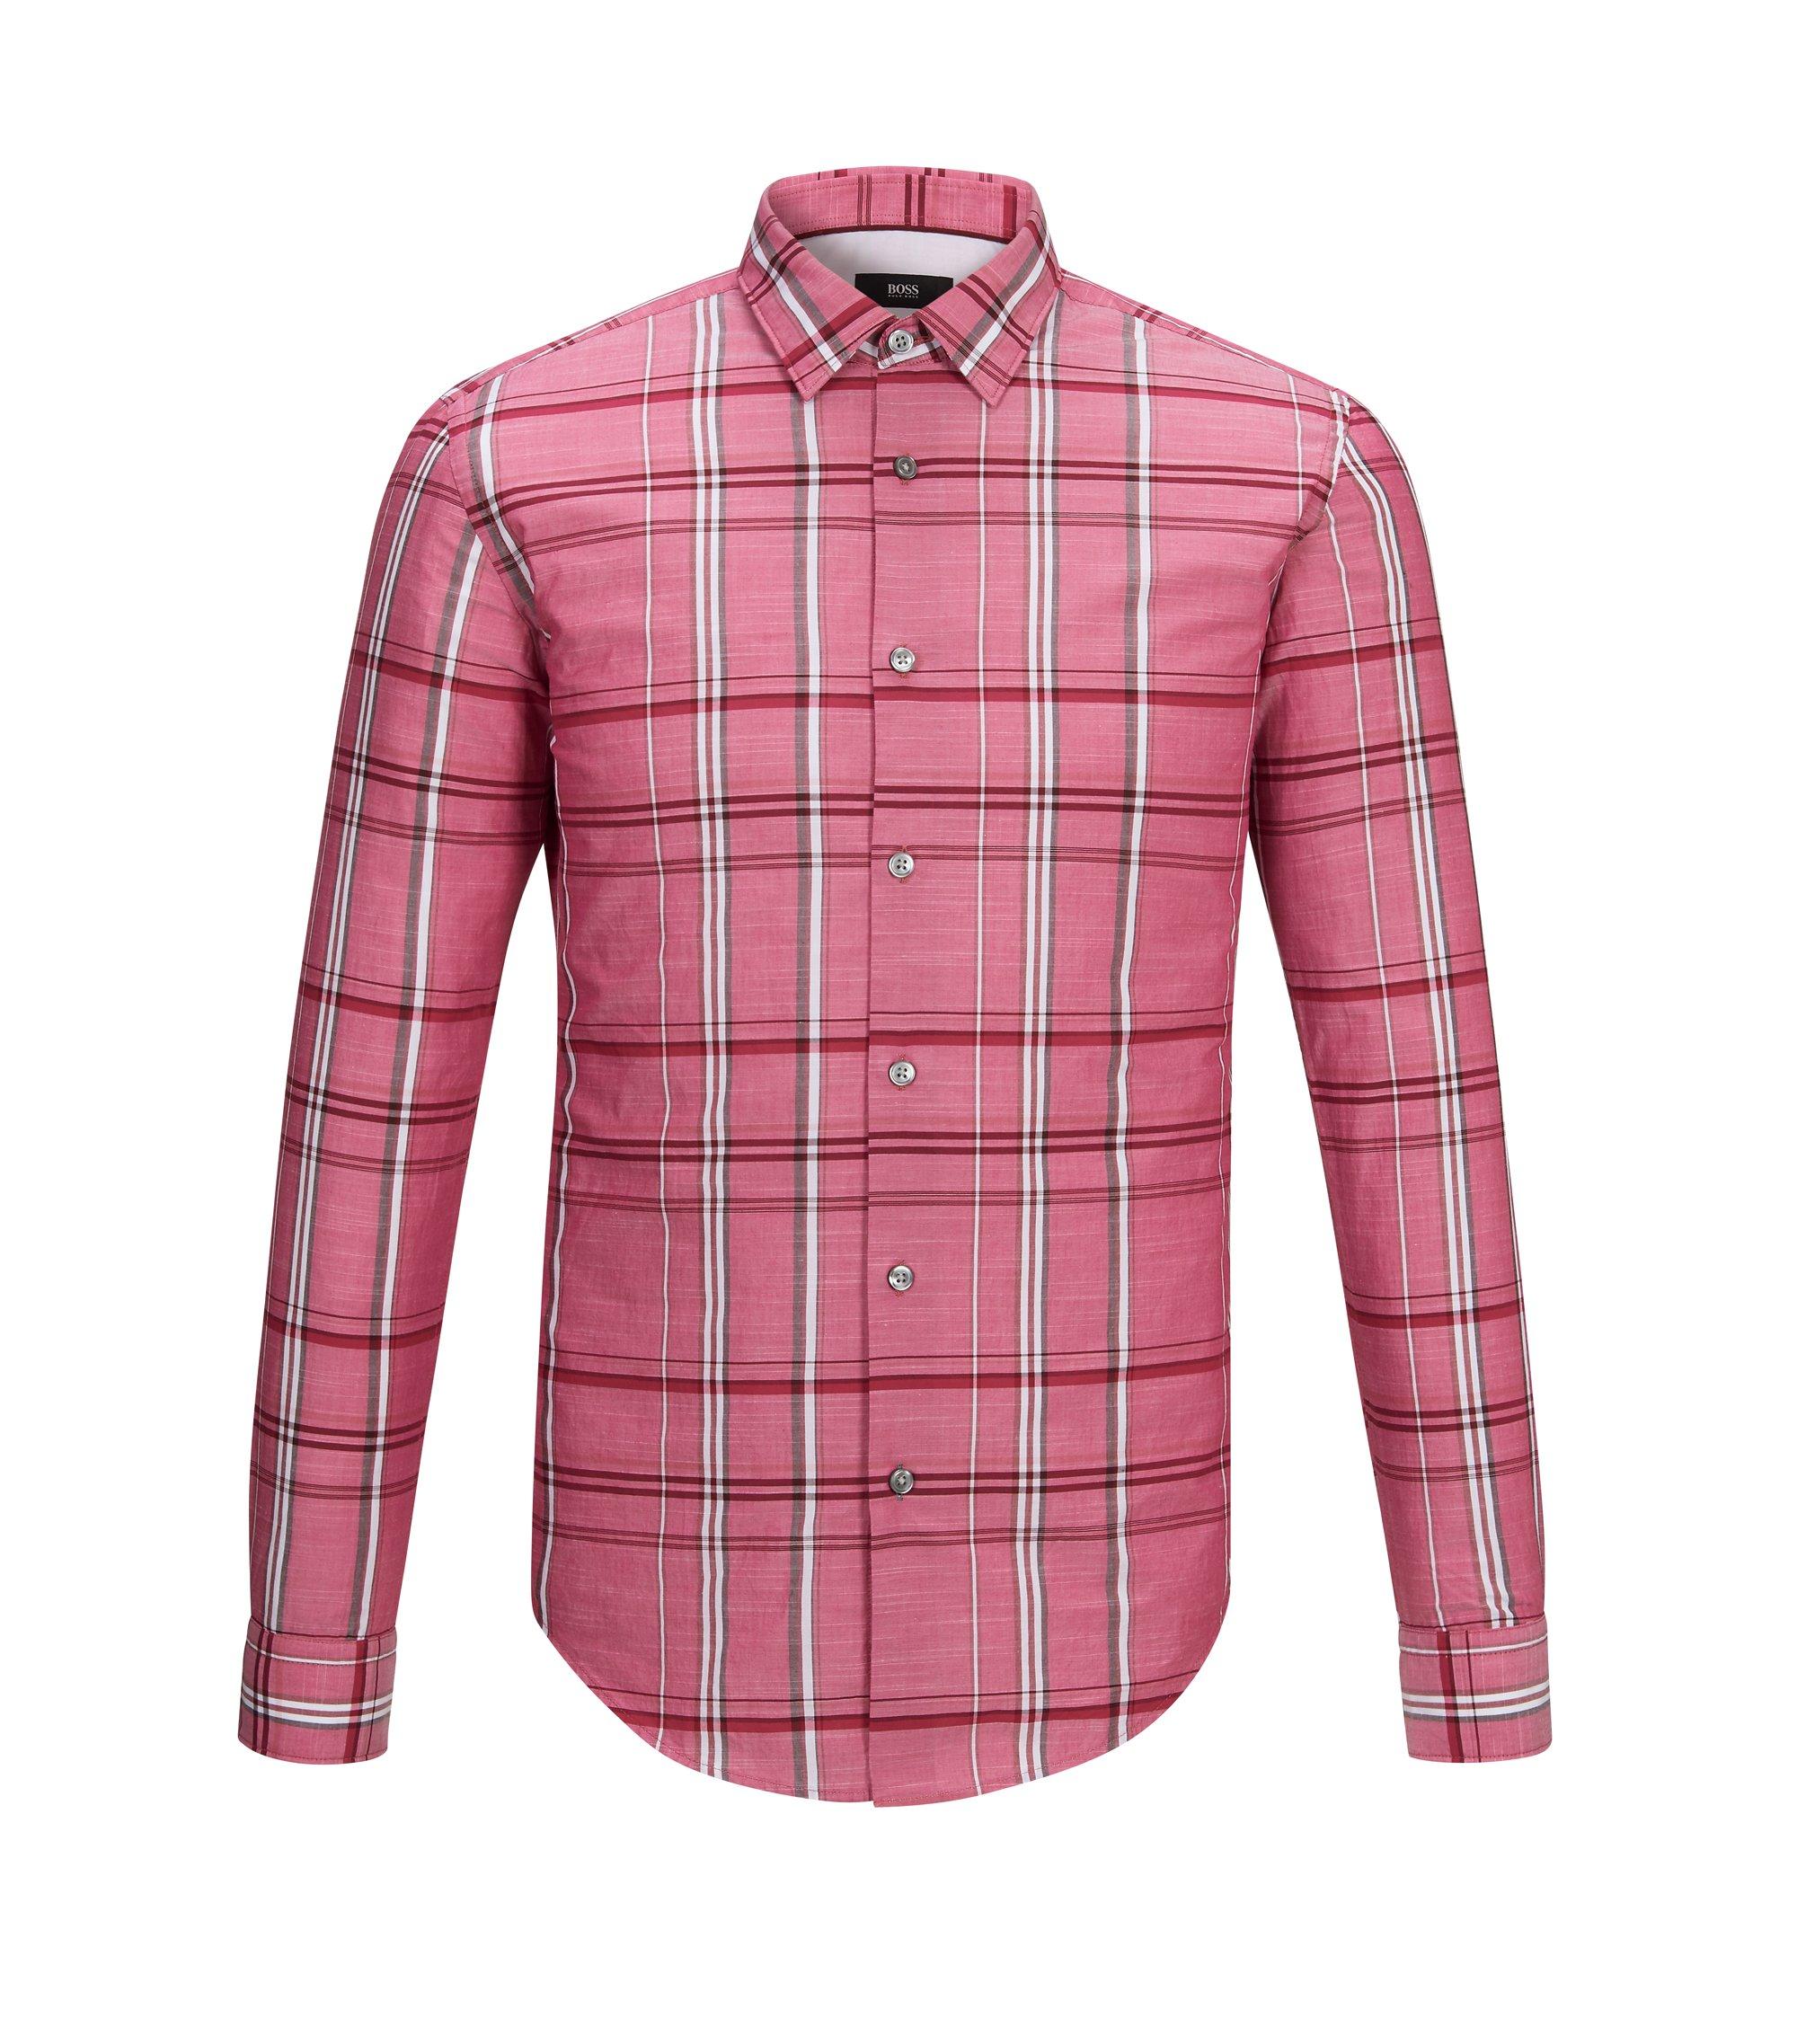 Plaid Cotton Button Down Shirt, Slim Fit | Ronni, Red